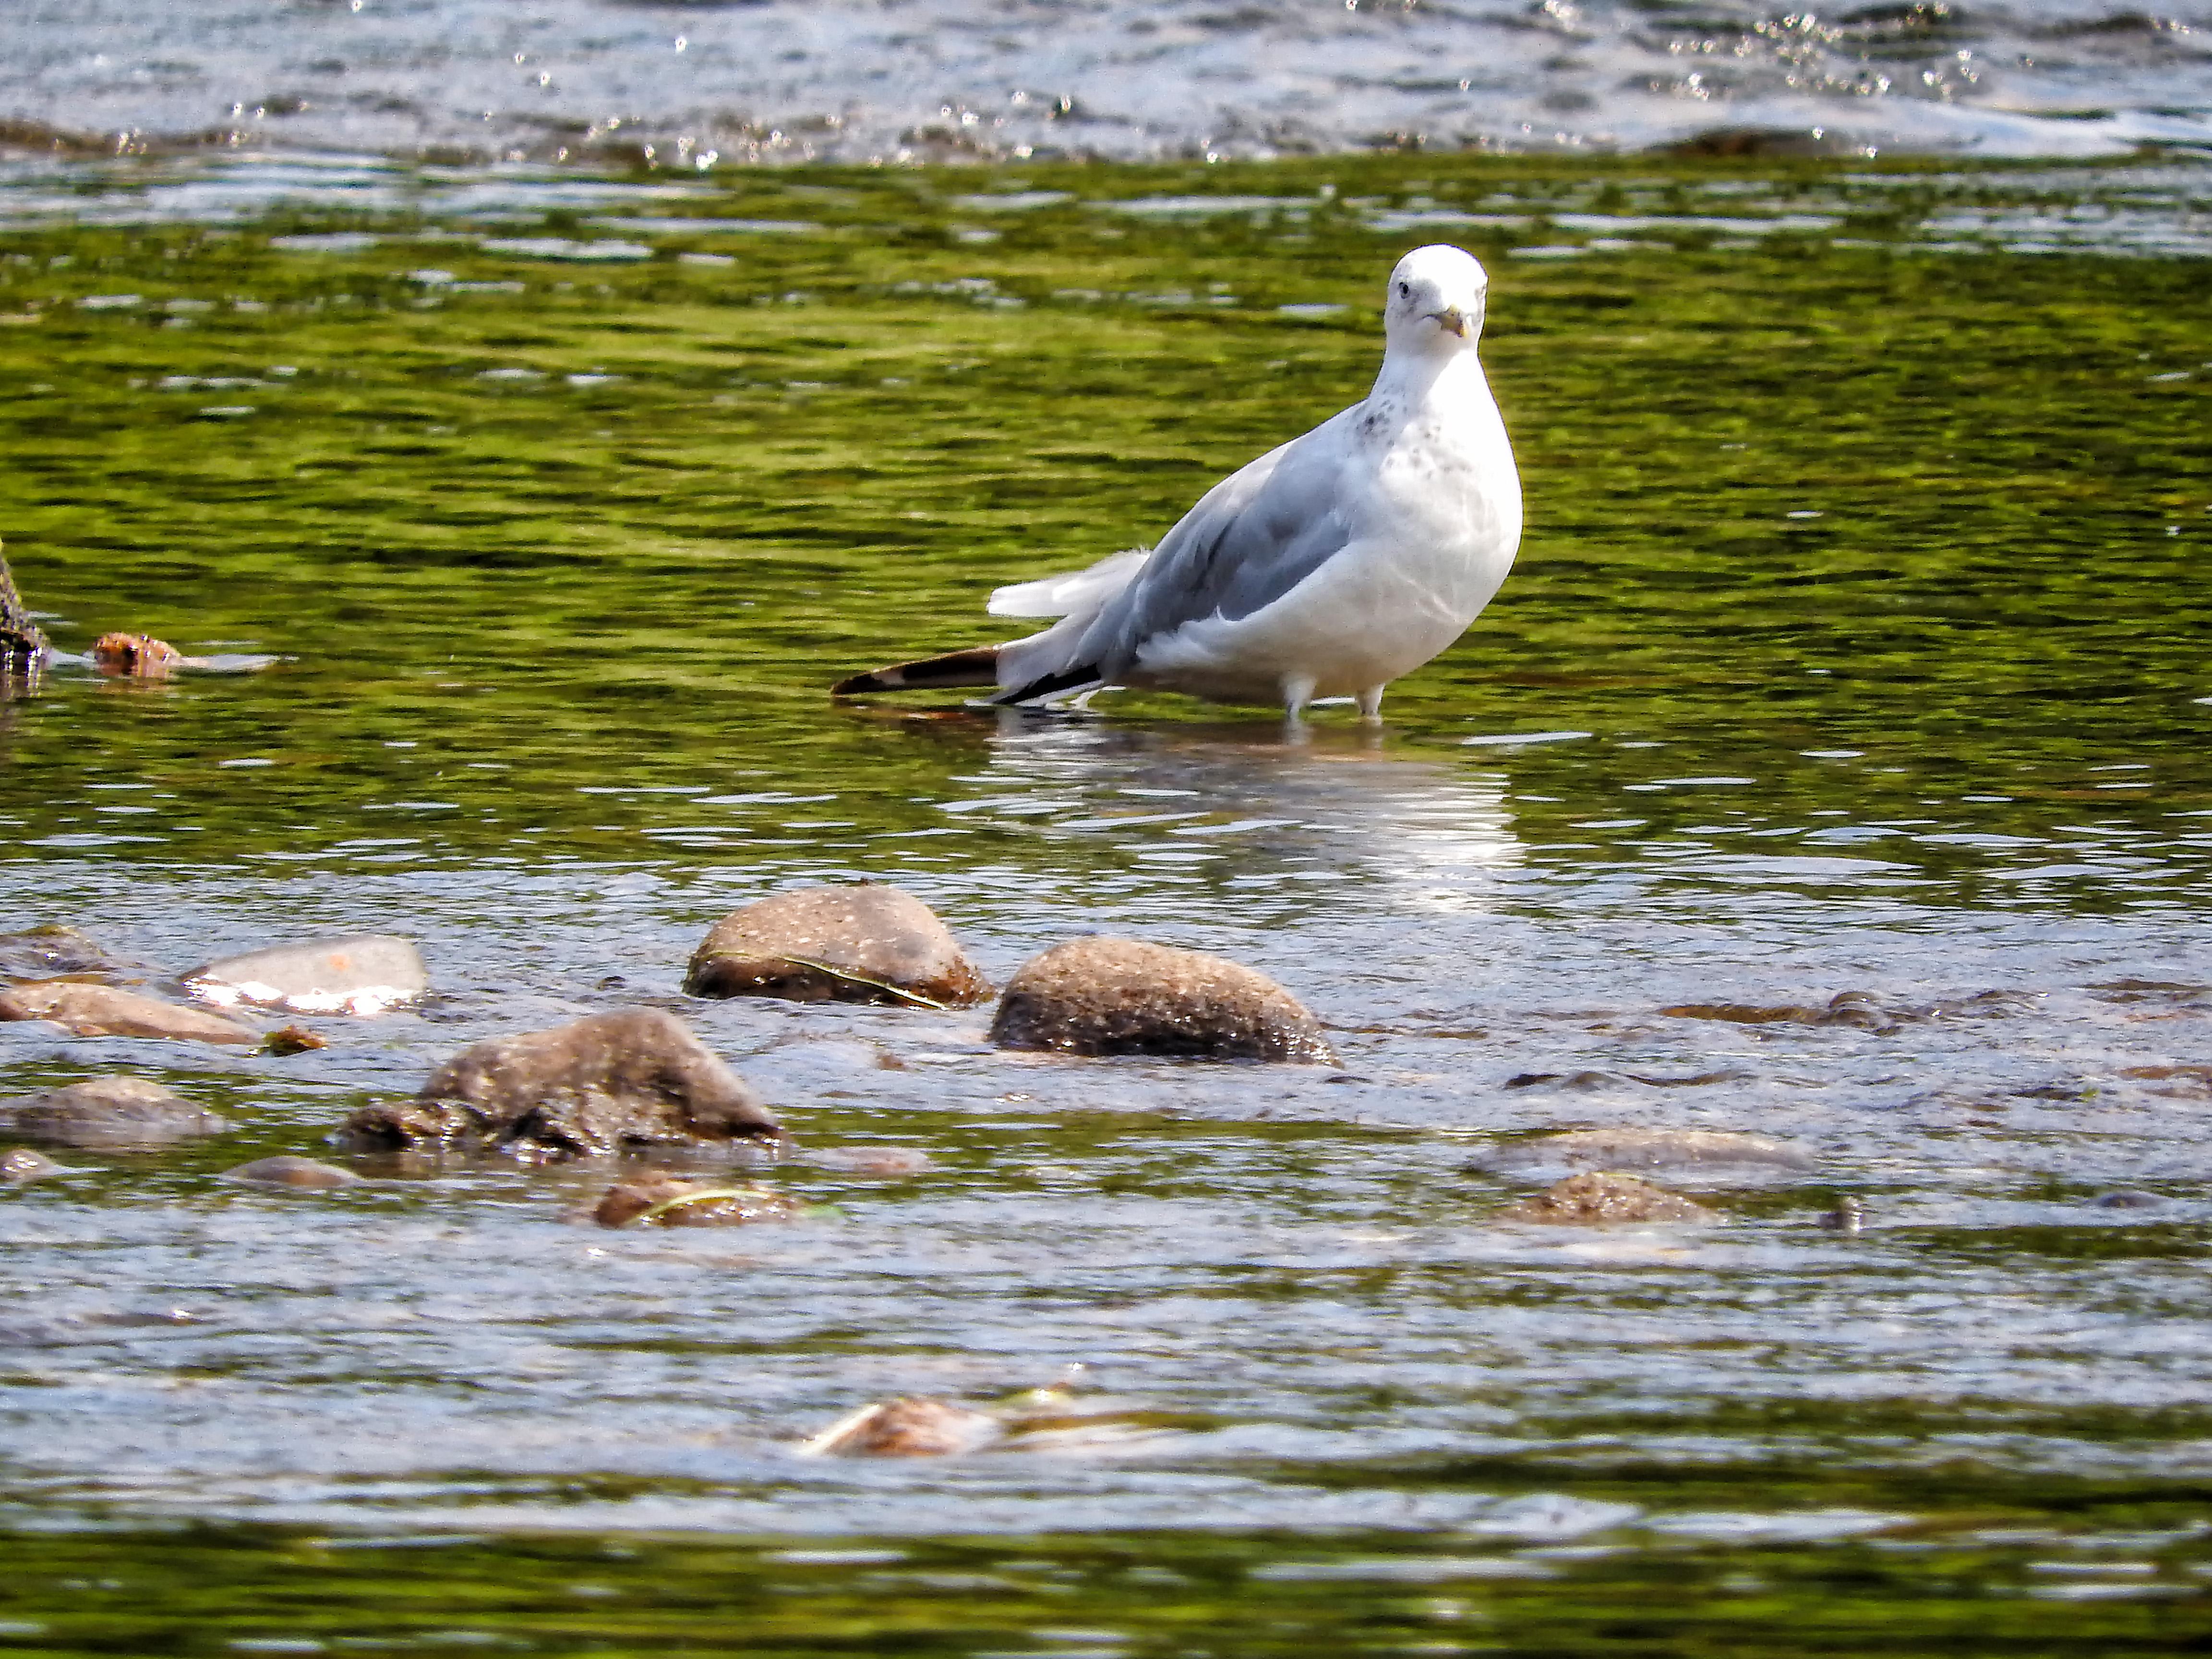 Oiseau (Goéland À Bec Cerclé) 046, A, Bec, Billed, Bird, HQ Photo